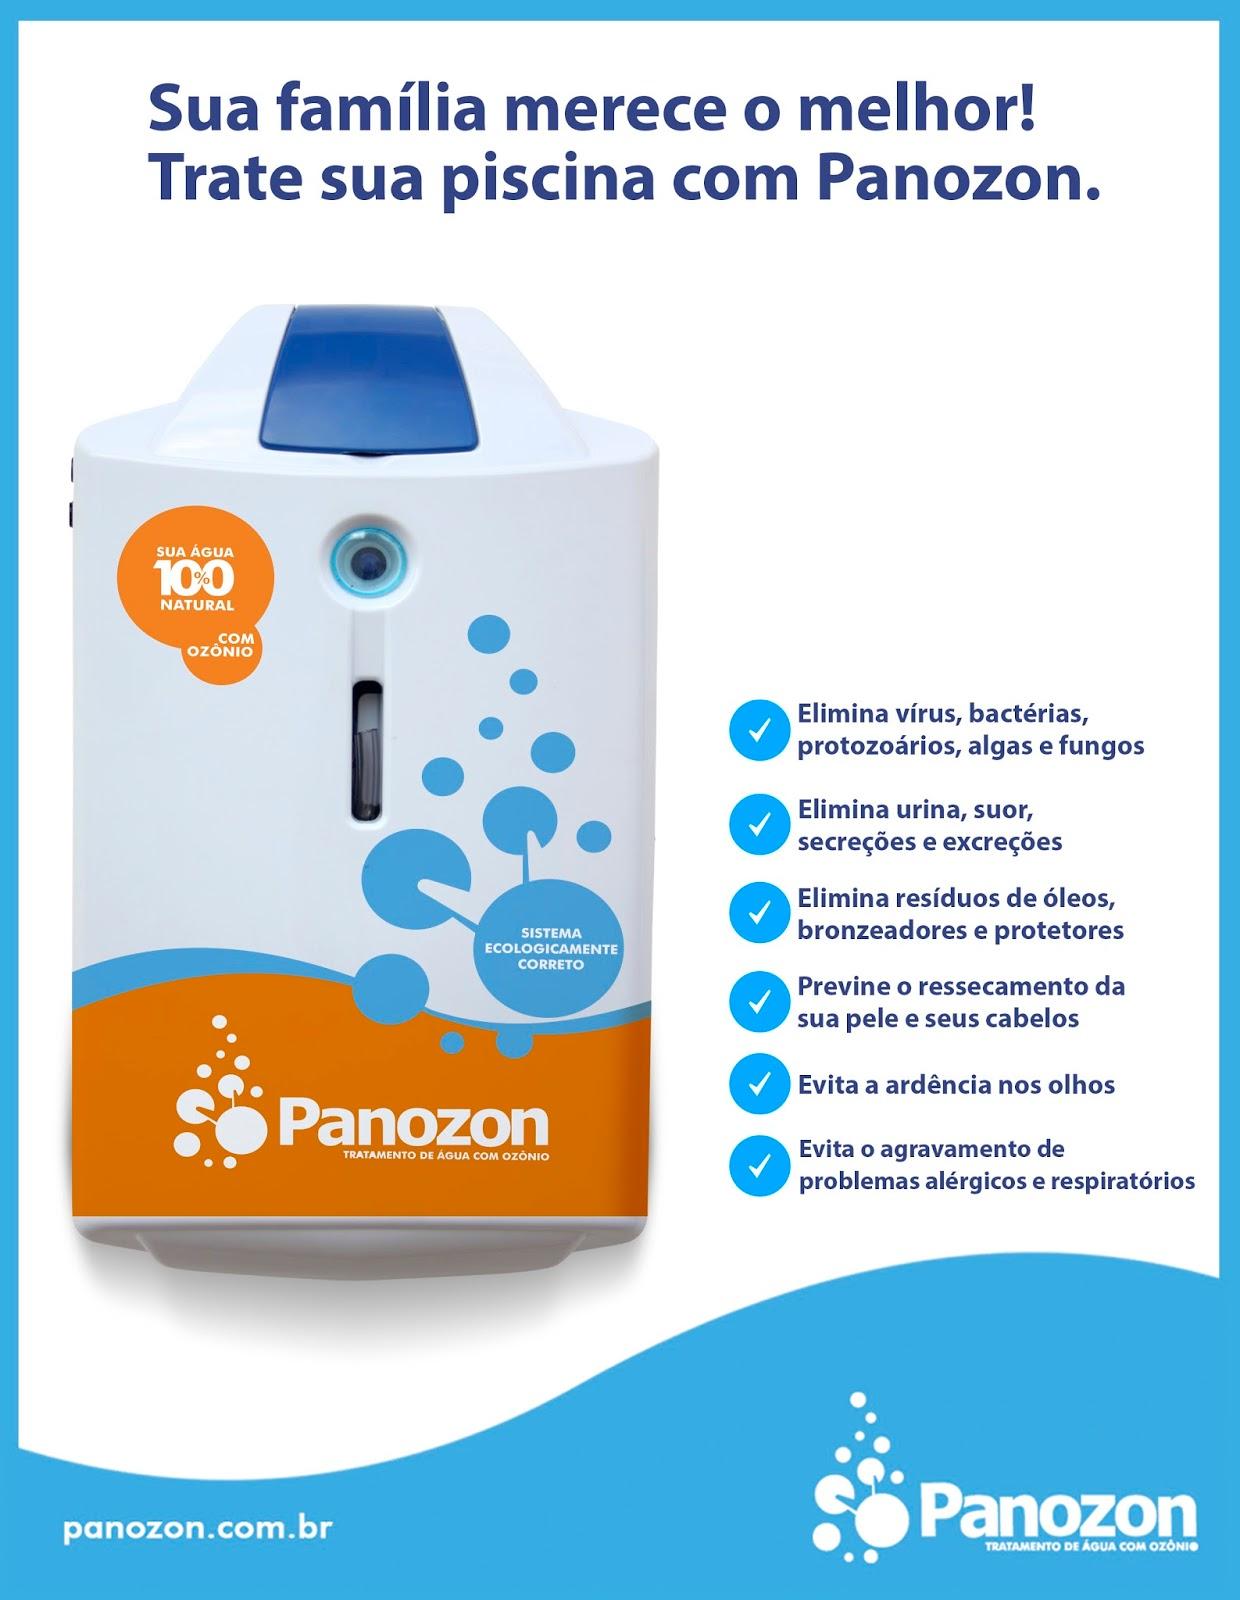 Como tratar piscina com ozônio - Sistema Panozon